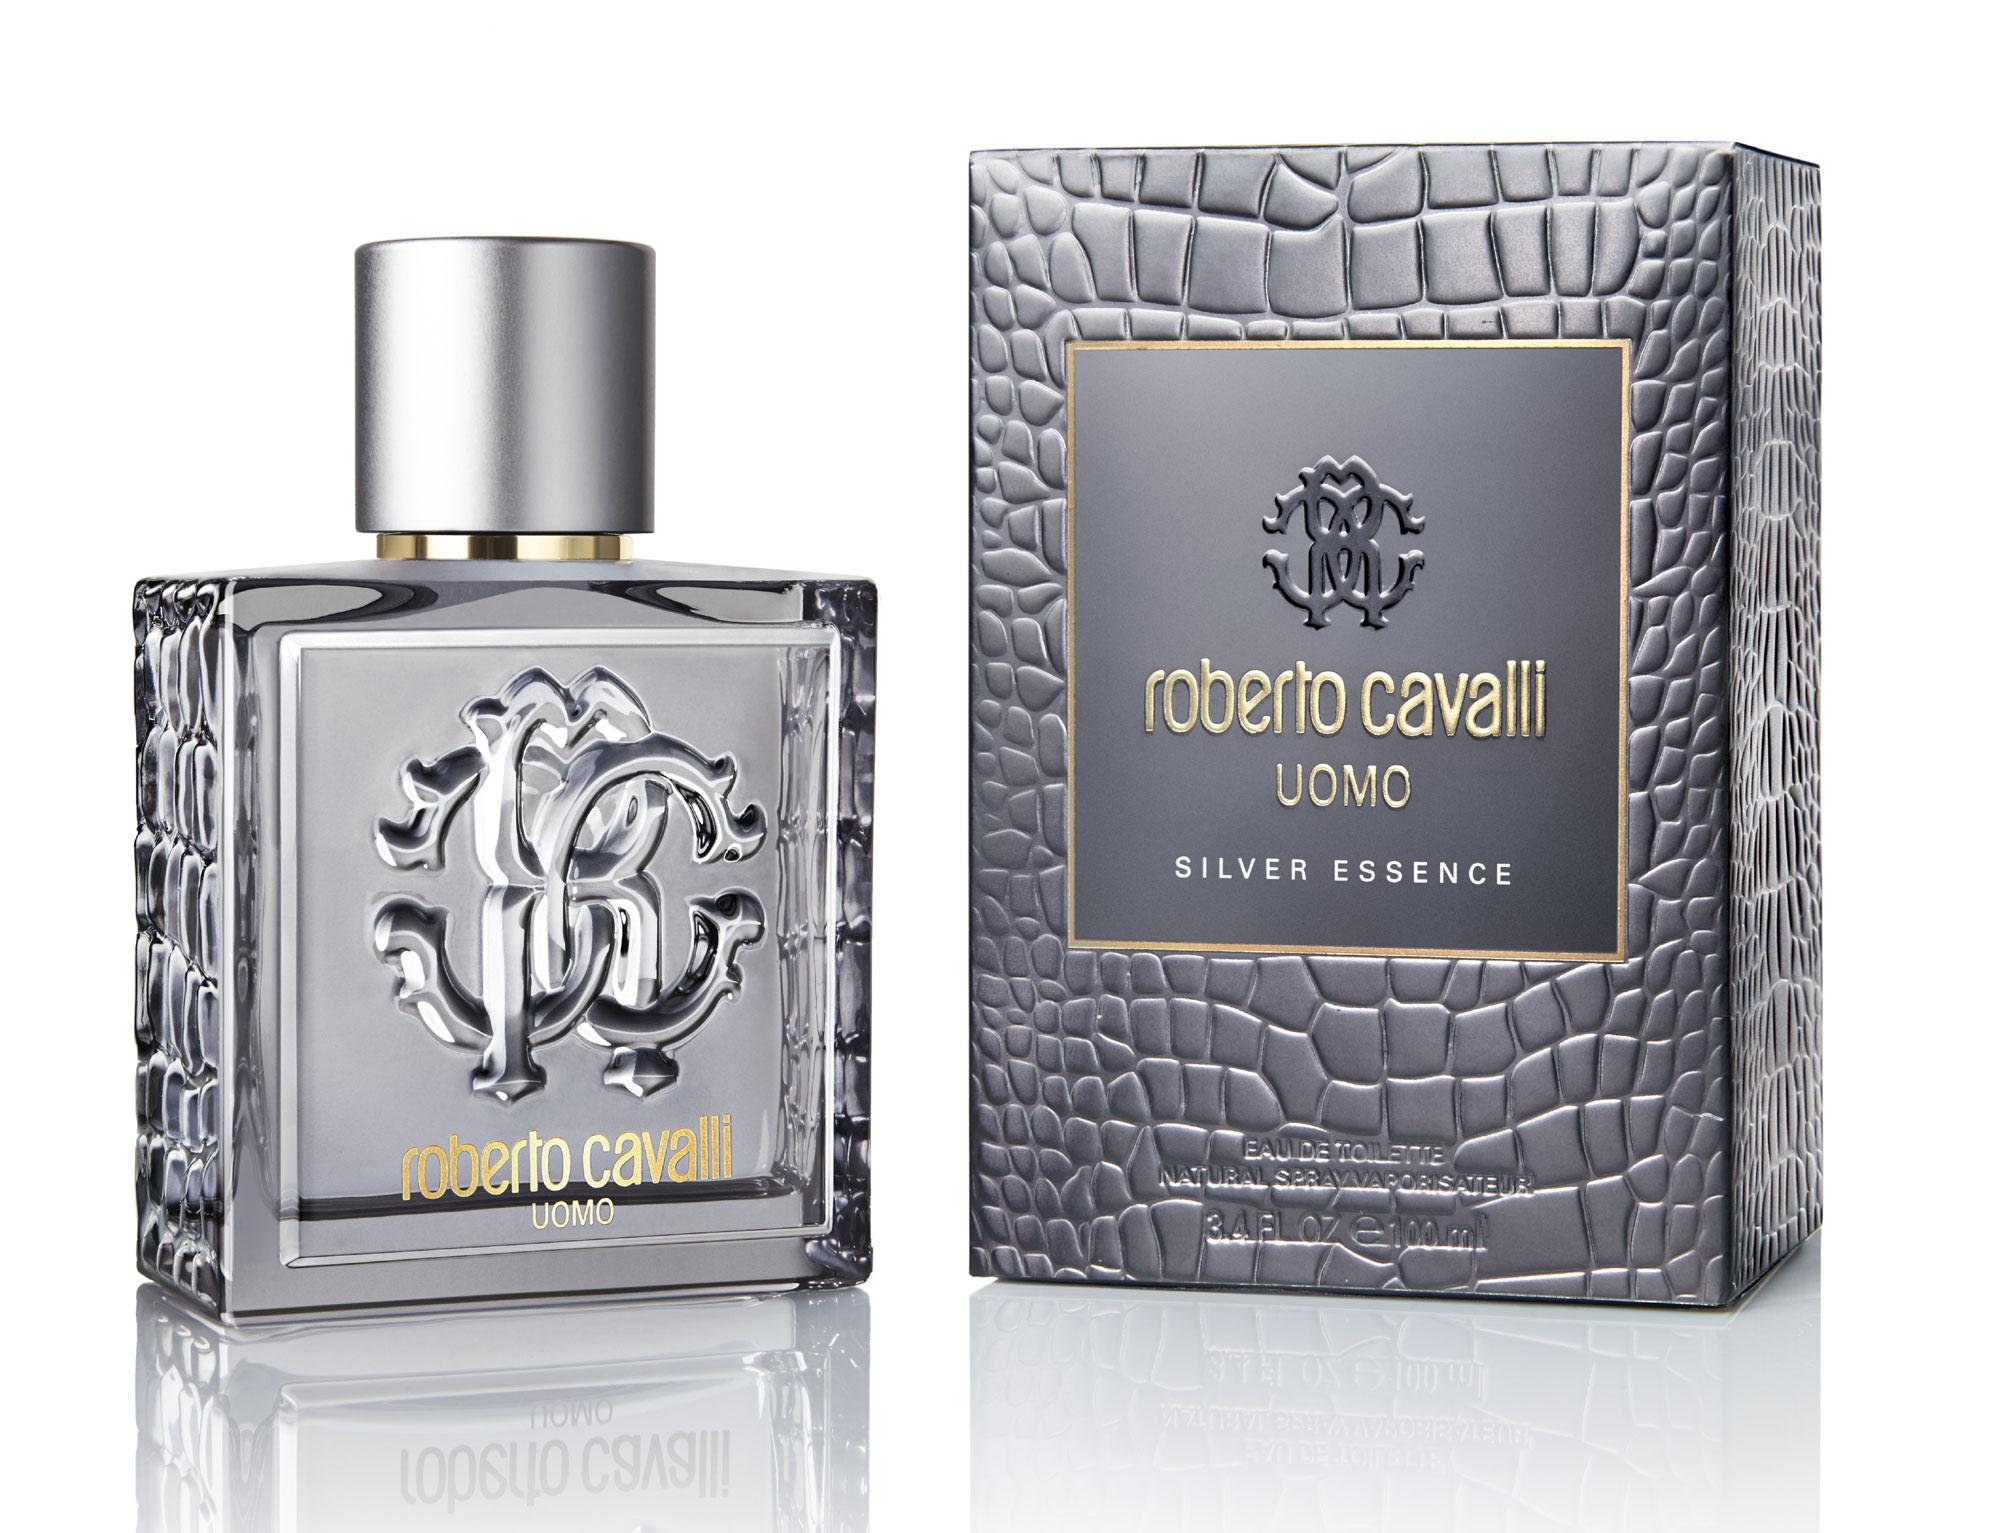 ... Roberto Cavalli Uomo Silver Essence Roberto Cavalli for men Pictures ... dbb870ab28